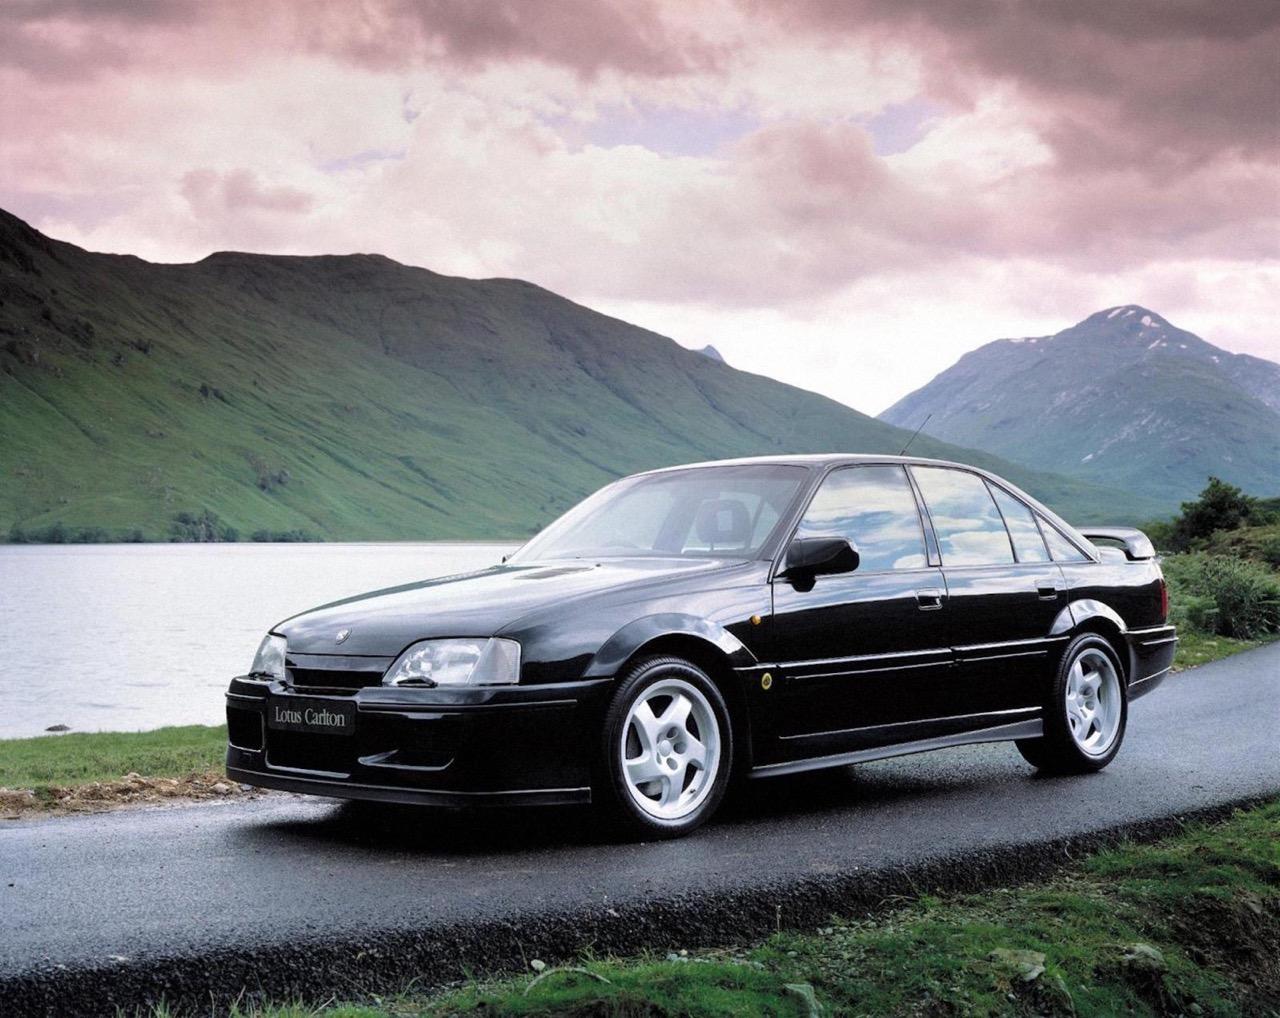 Opel Omega Lotus - Le monstre des 90's ! 50